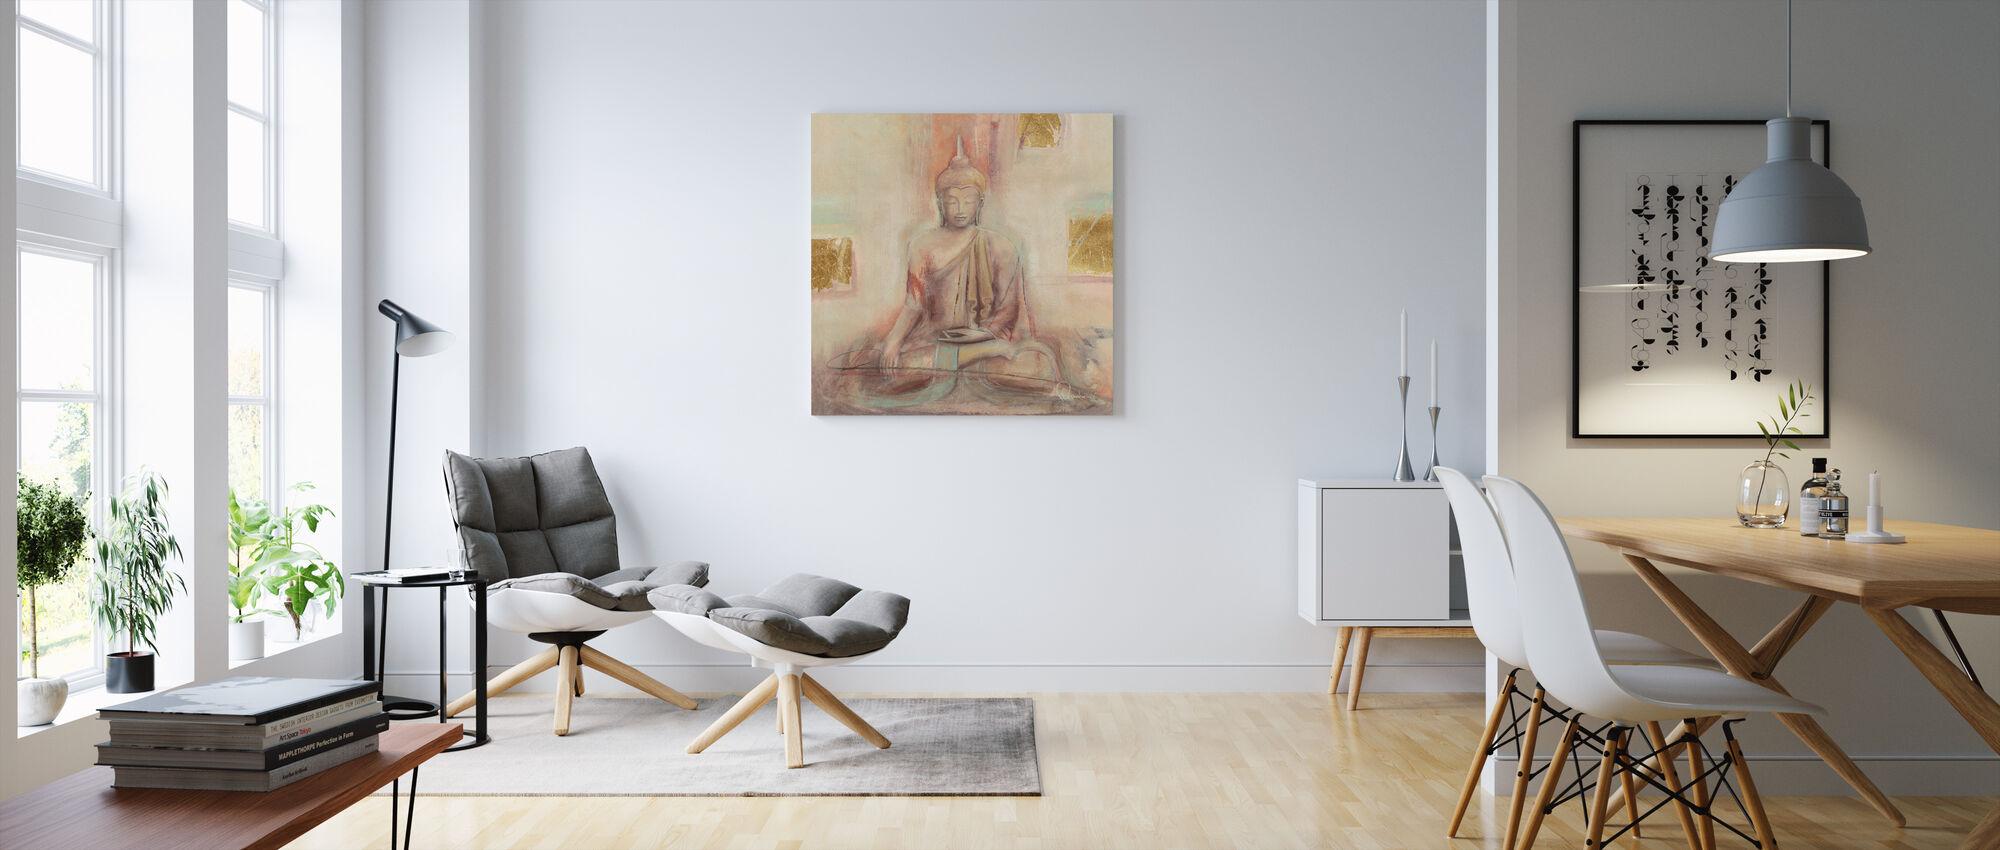 Buddha I - Canvastaulu - Olohuone